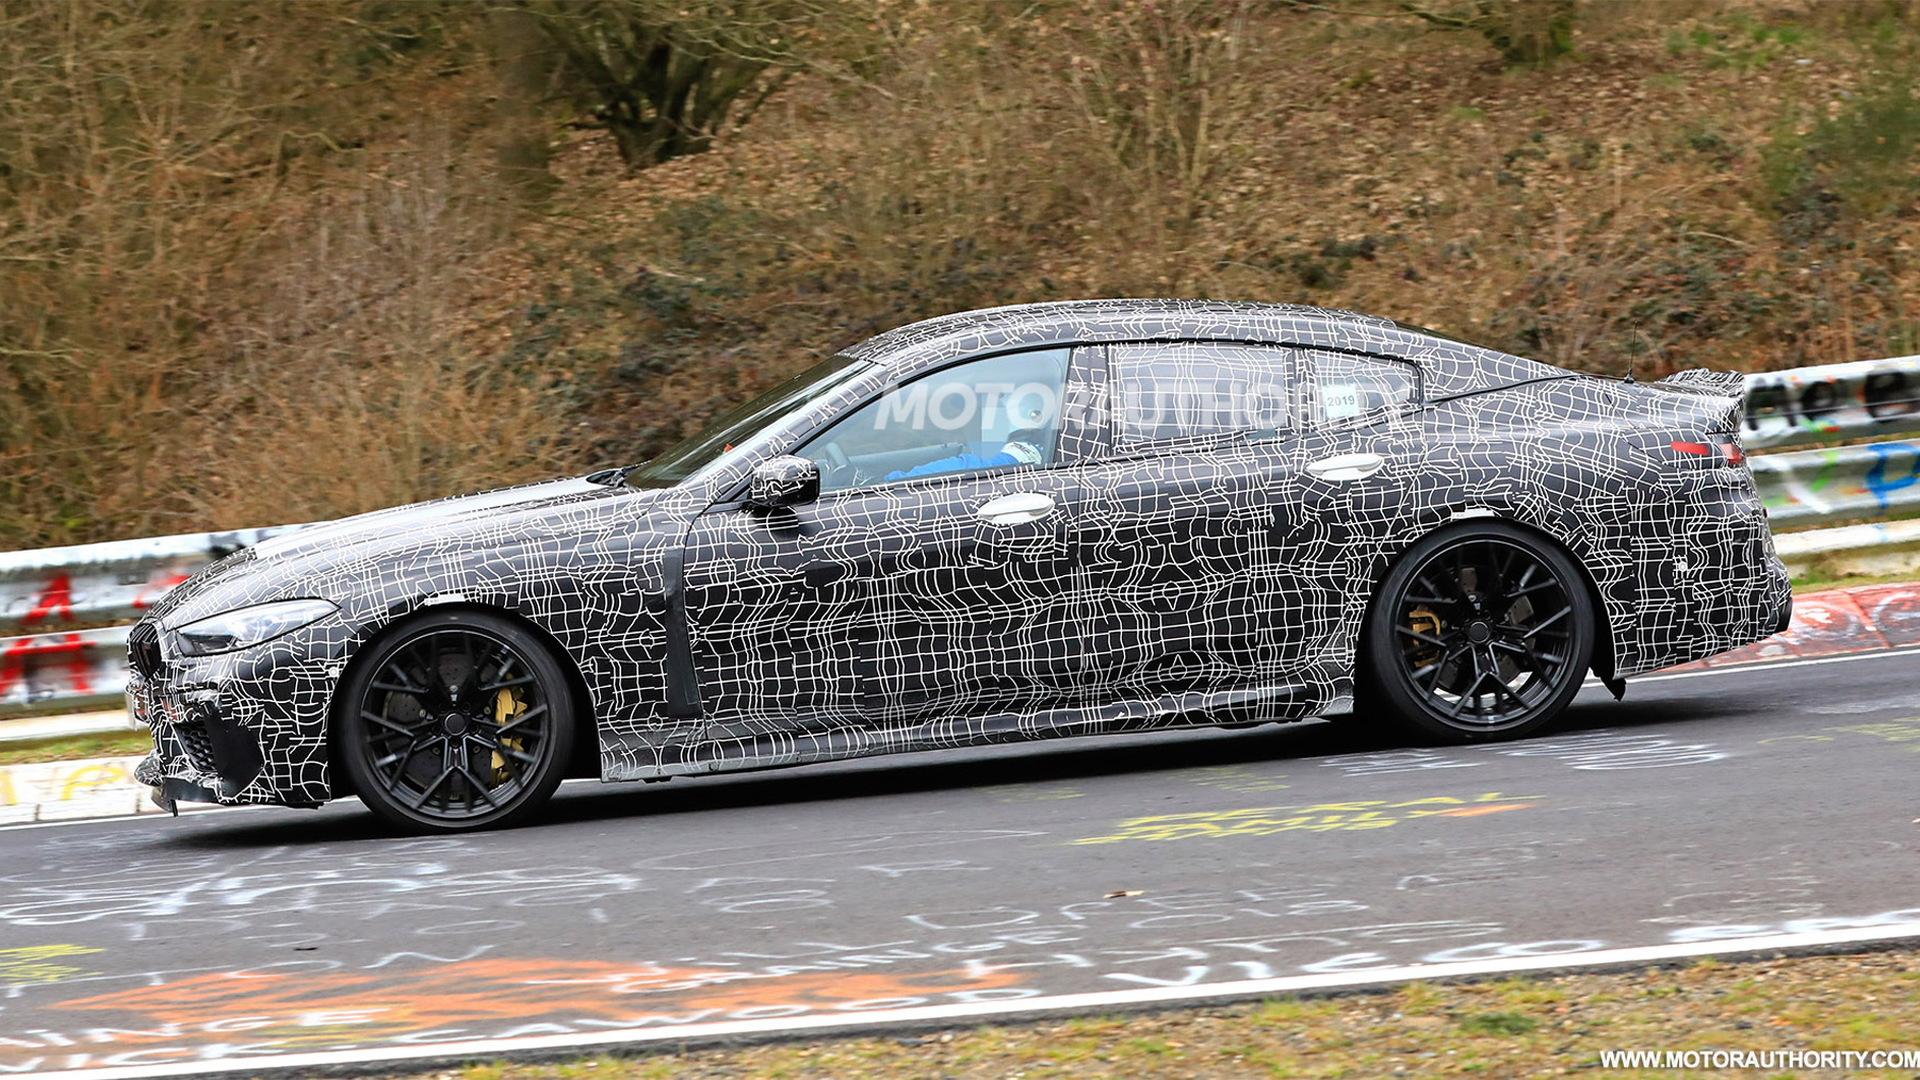 2020 BMW M8 Gran Coupe spy shots - Image via S. Baldauf/SB-Medien